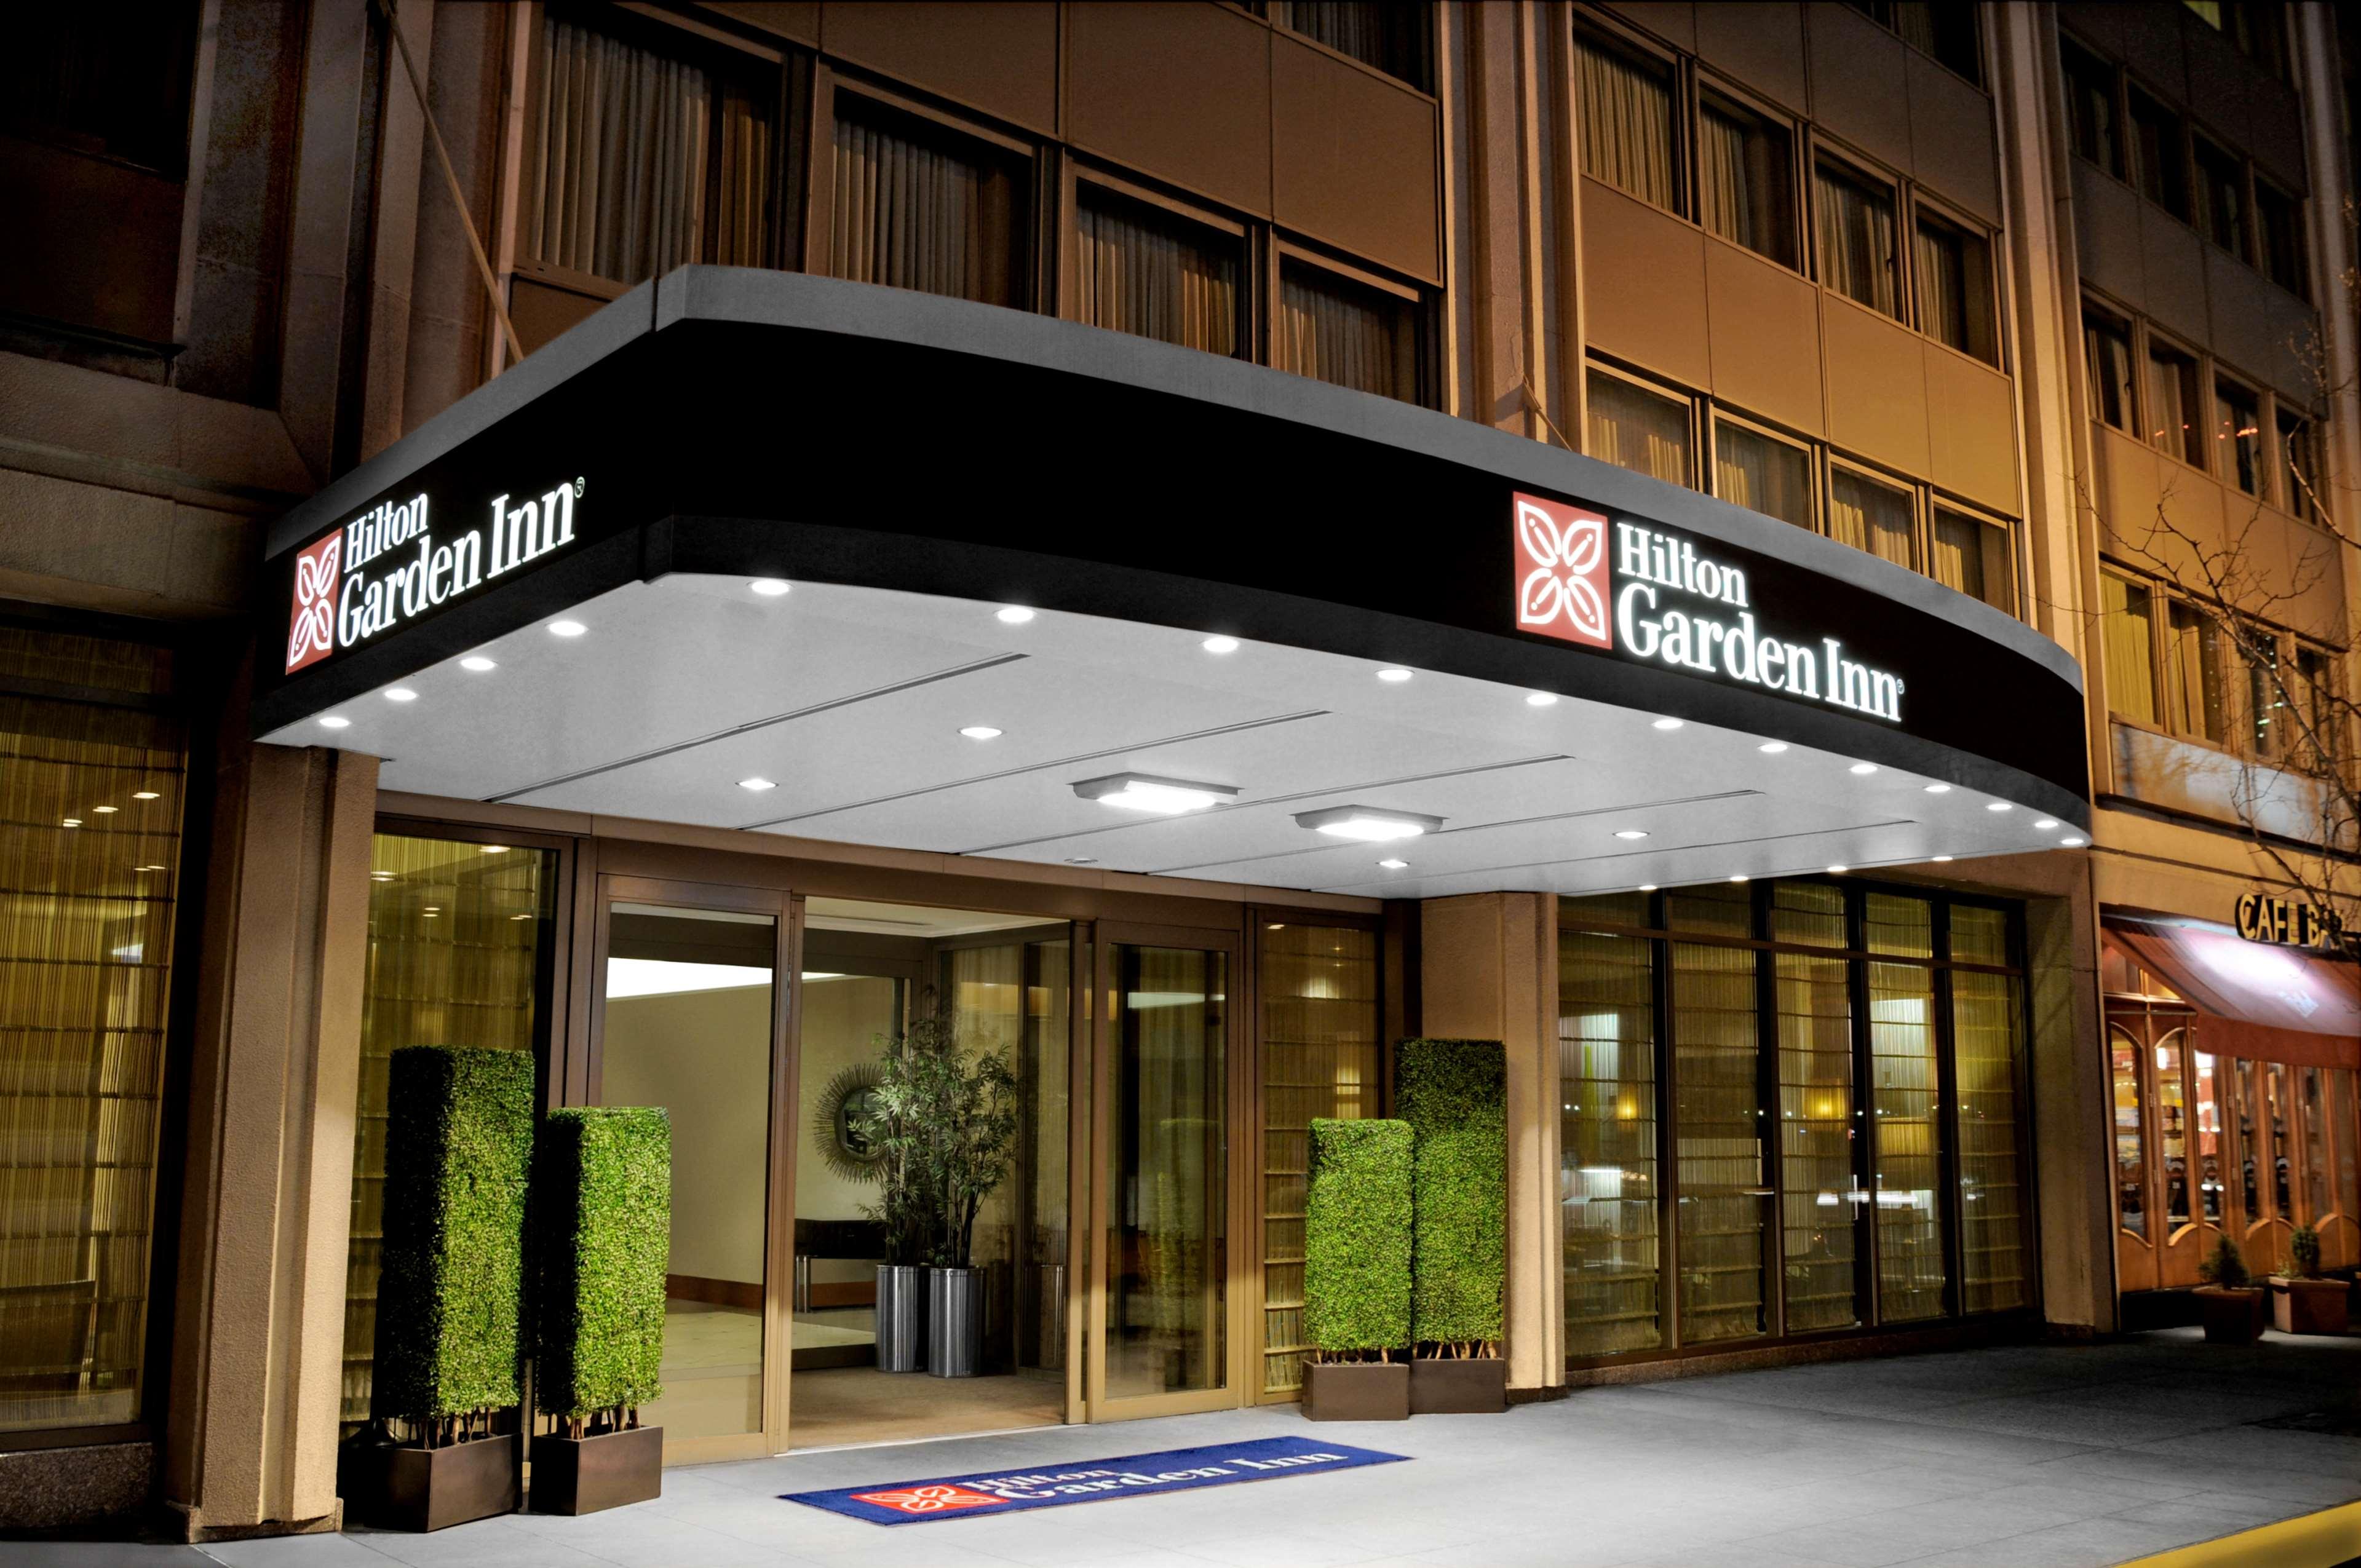 Hilton Garden Inn Times Square image 3